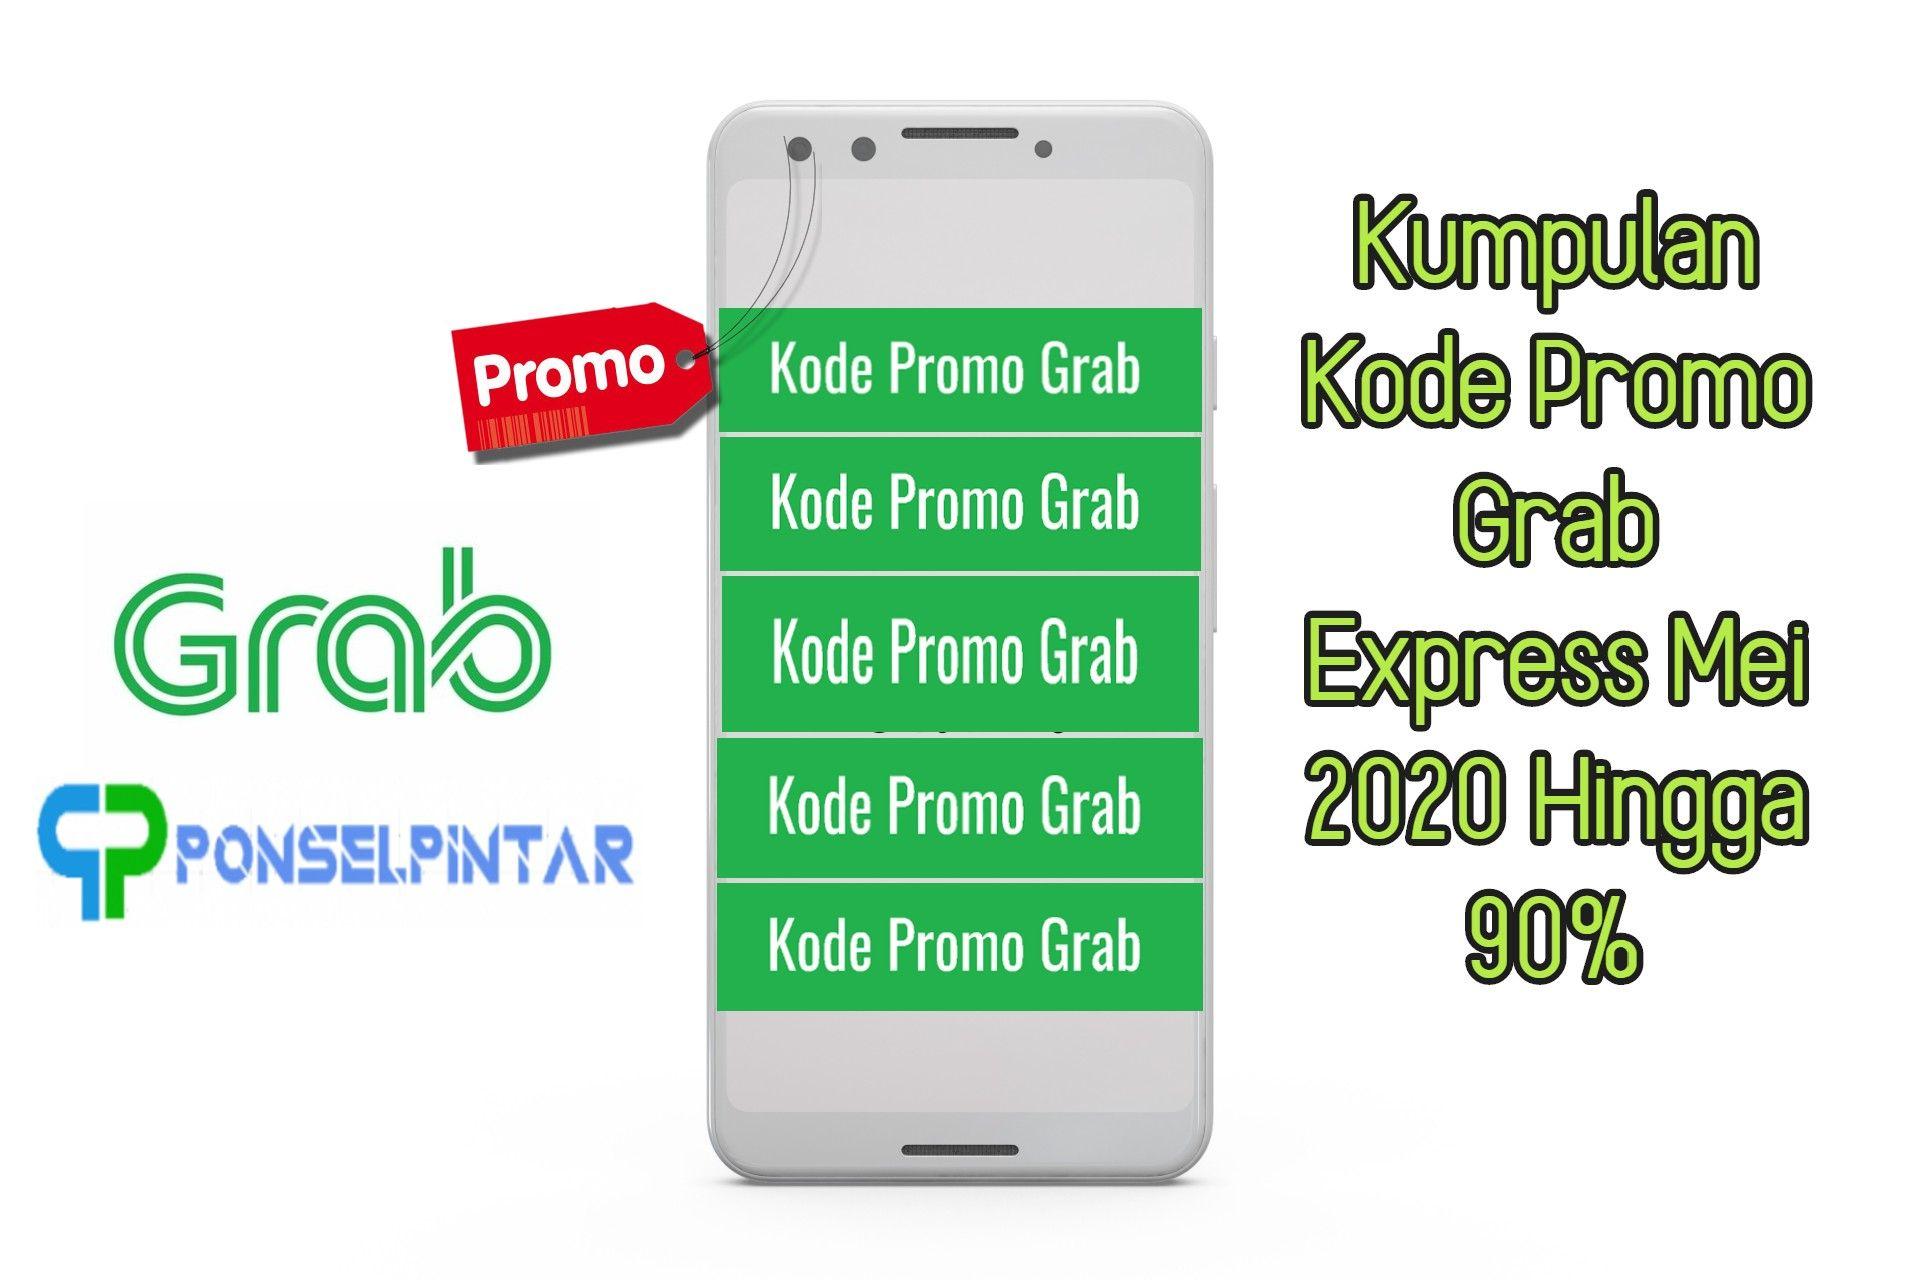 Kumpulan Kode Promo Grab Express Malang Penekanan Website